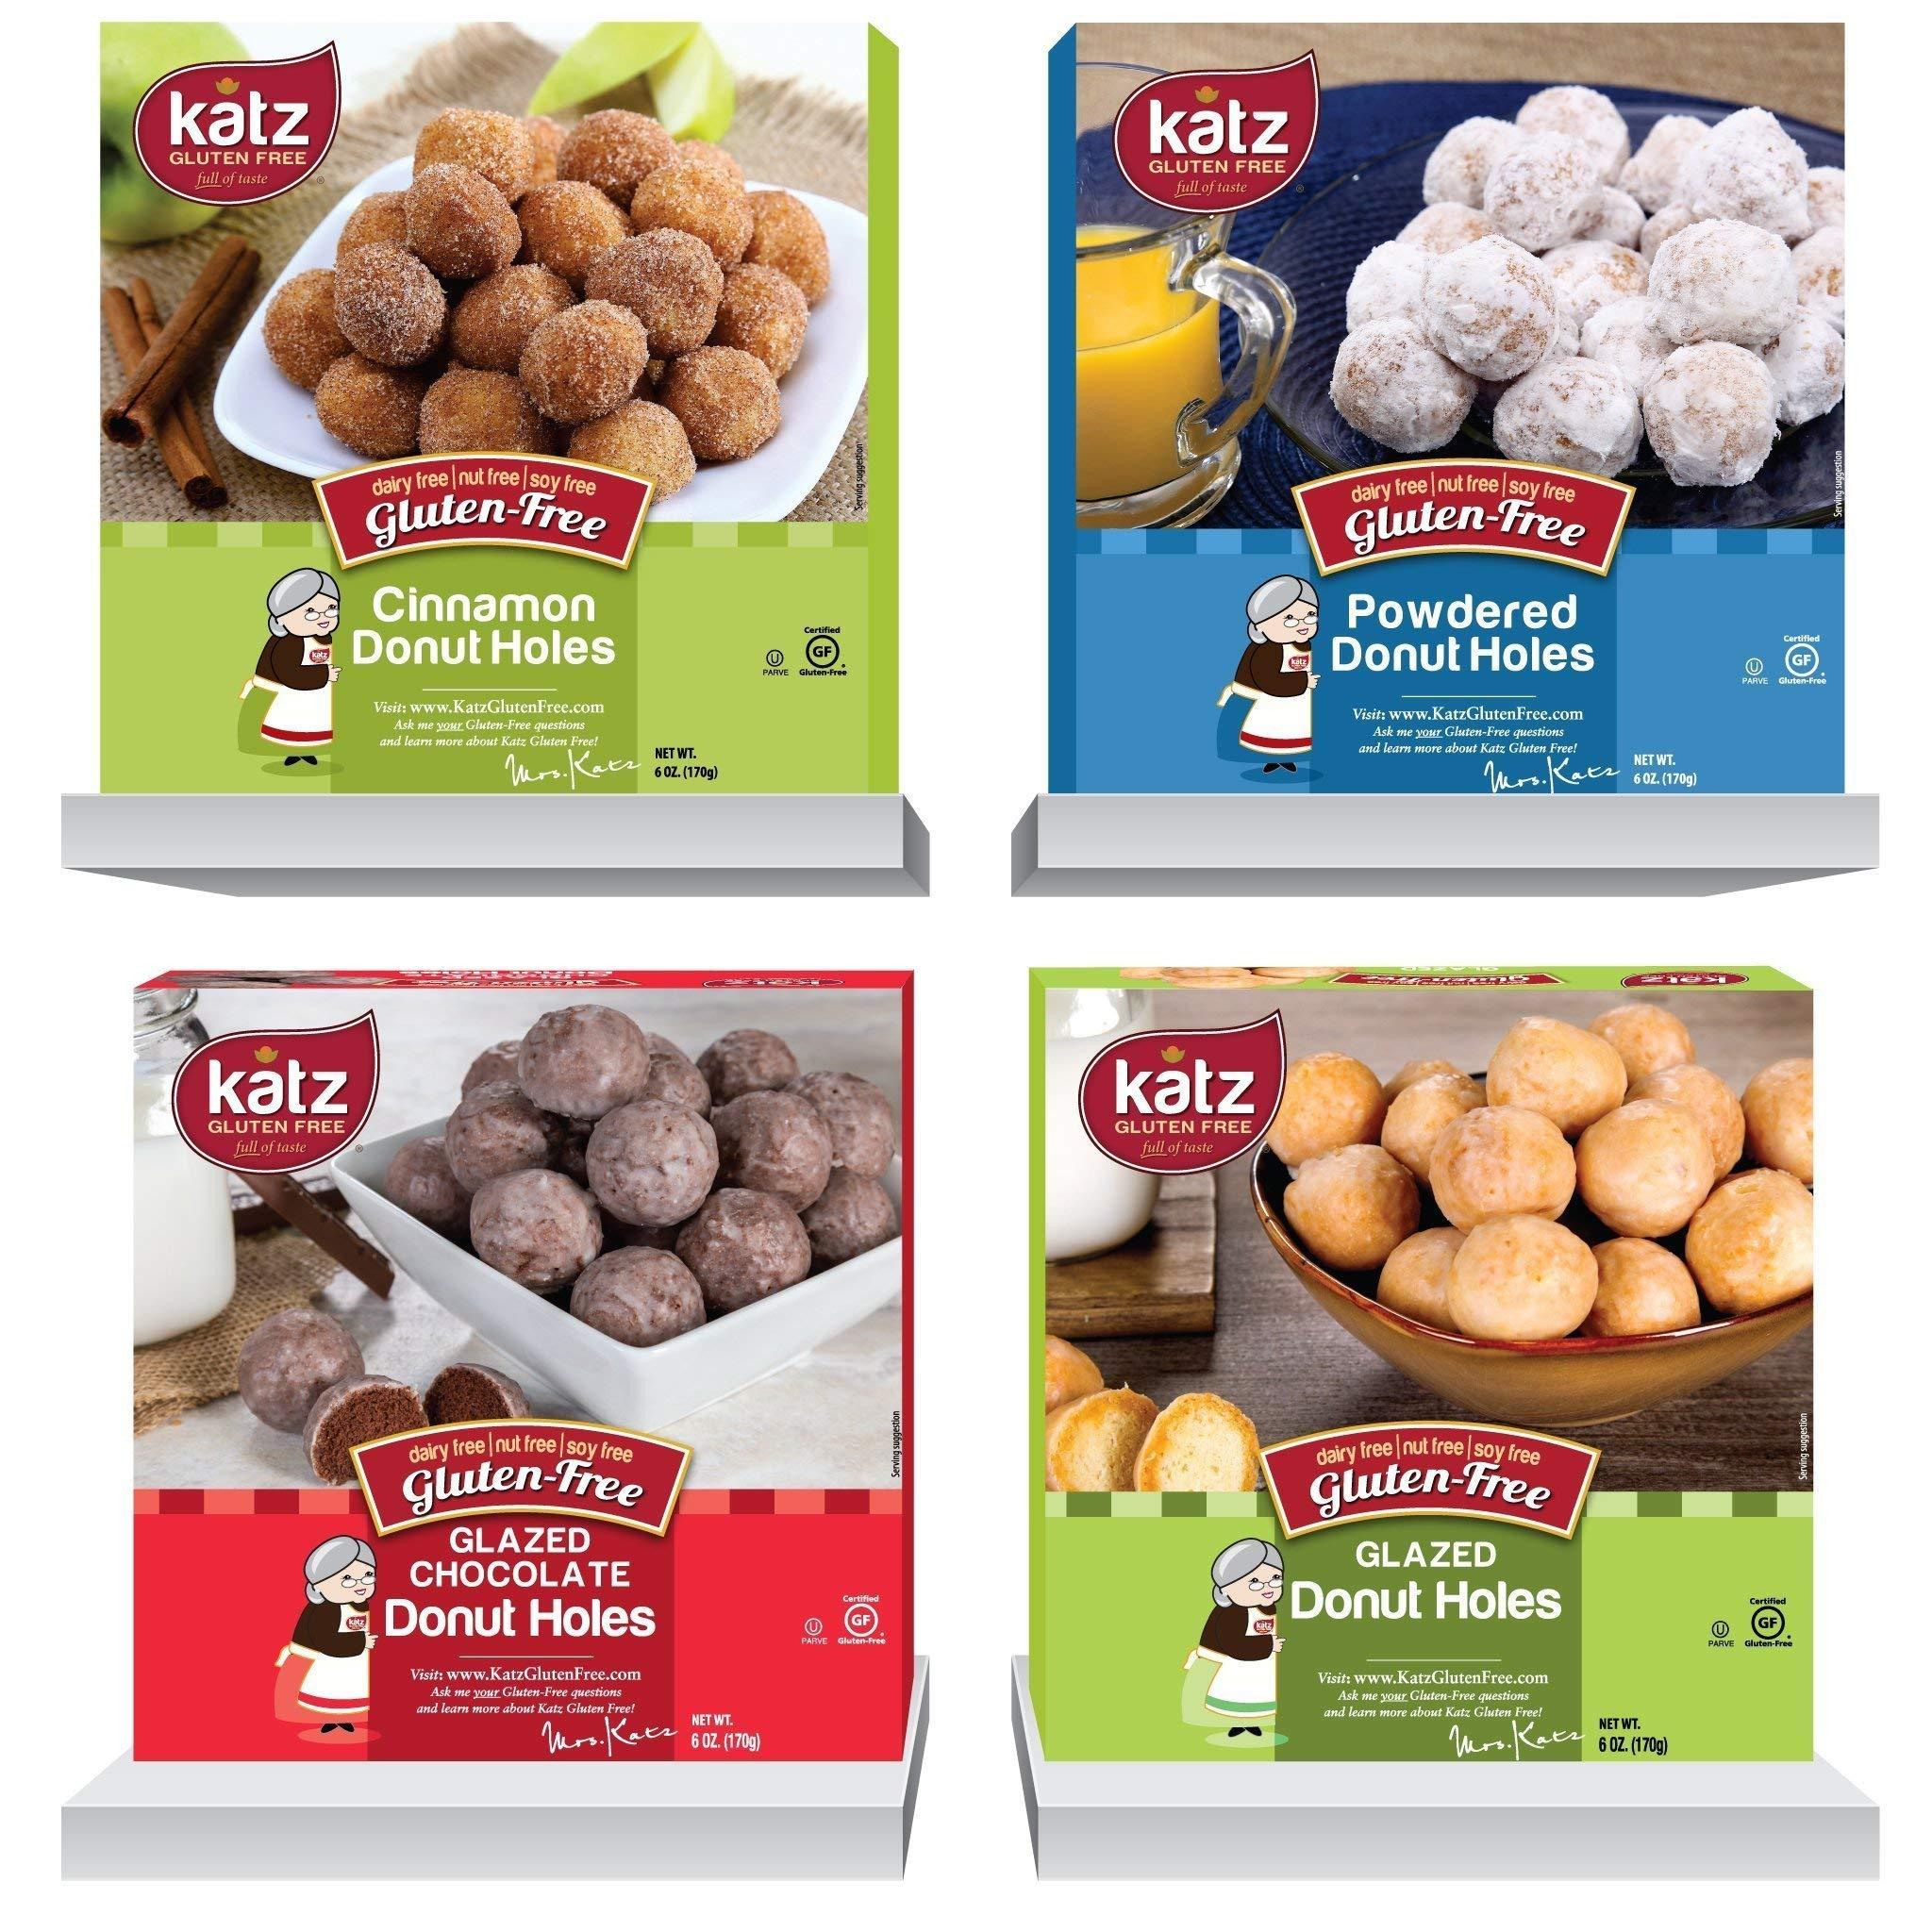 Katz Gluten Free Donut Holes Variety Pack | 1 x Powdered, 1 x Glazed, 1 x Glazed Chocolate, 1 x Cinnamon | Dairy, Nut, Soy and Gluten Free | Kosher (1 Pack of each) by Katz Gluten Free